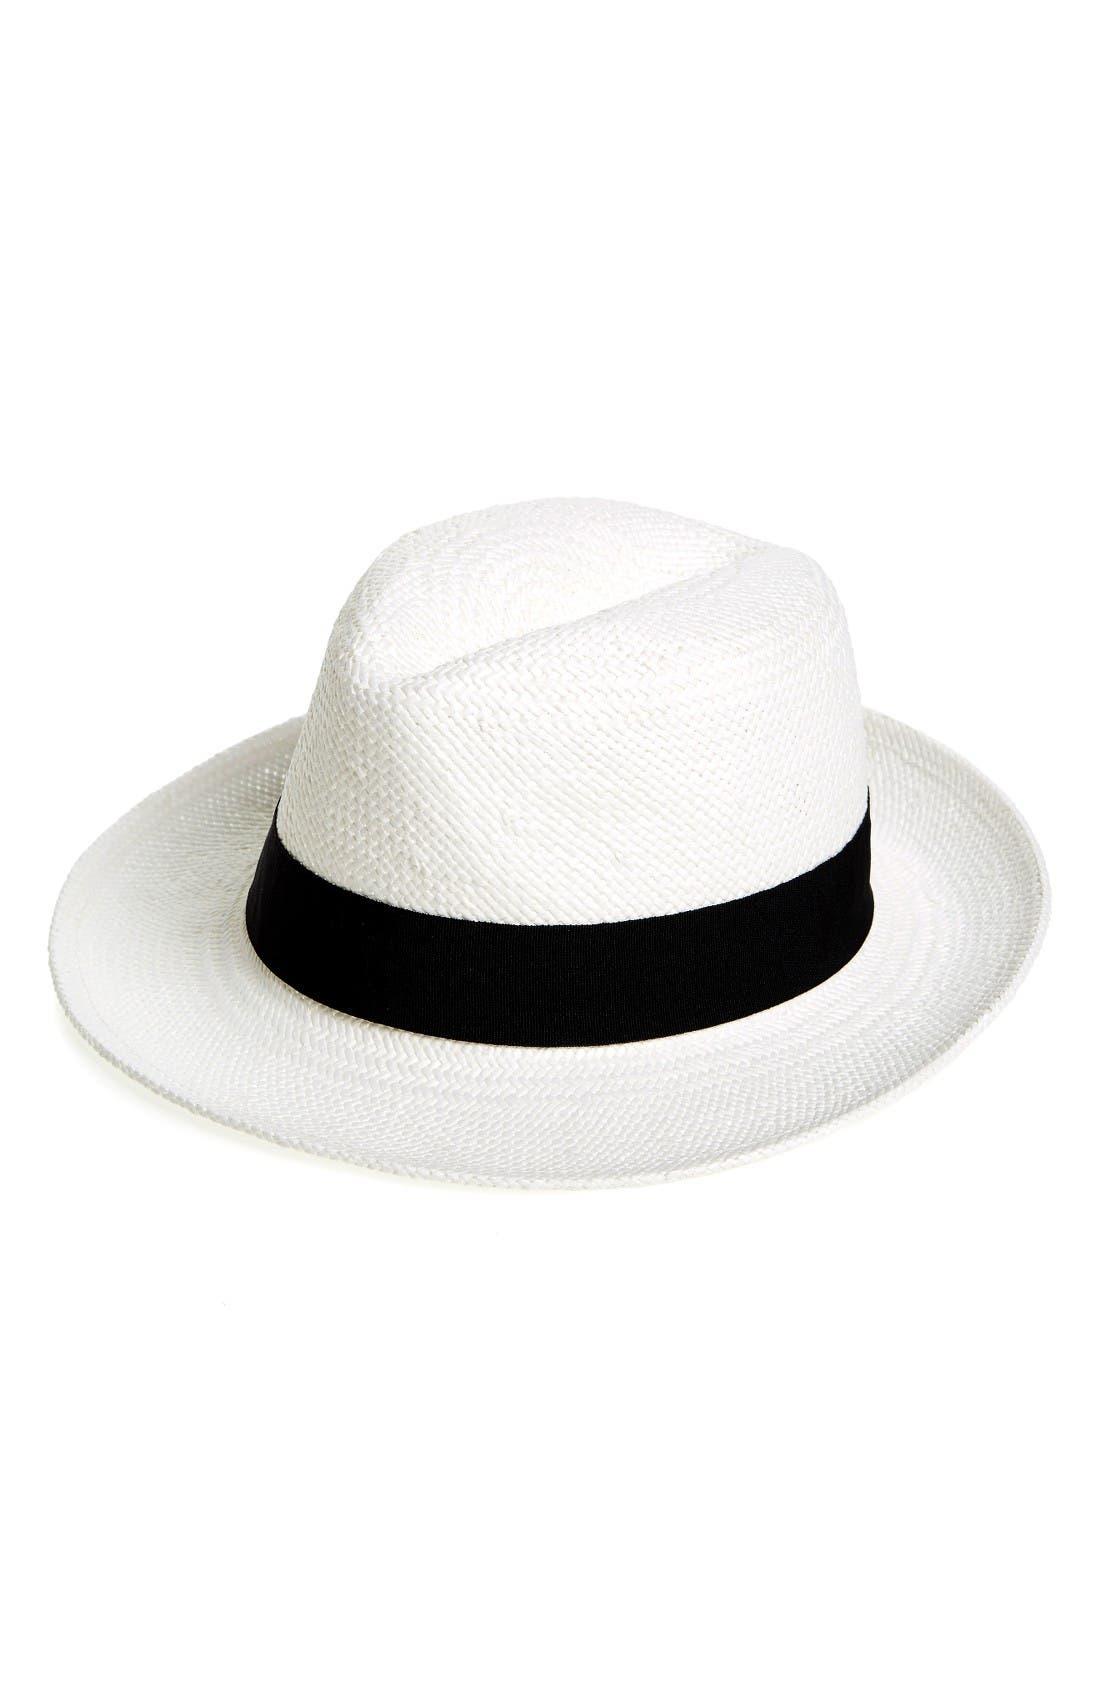 Straw Panama Hat,                             Main thumbnail 1, color,                             White